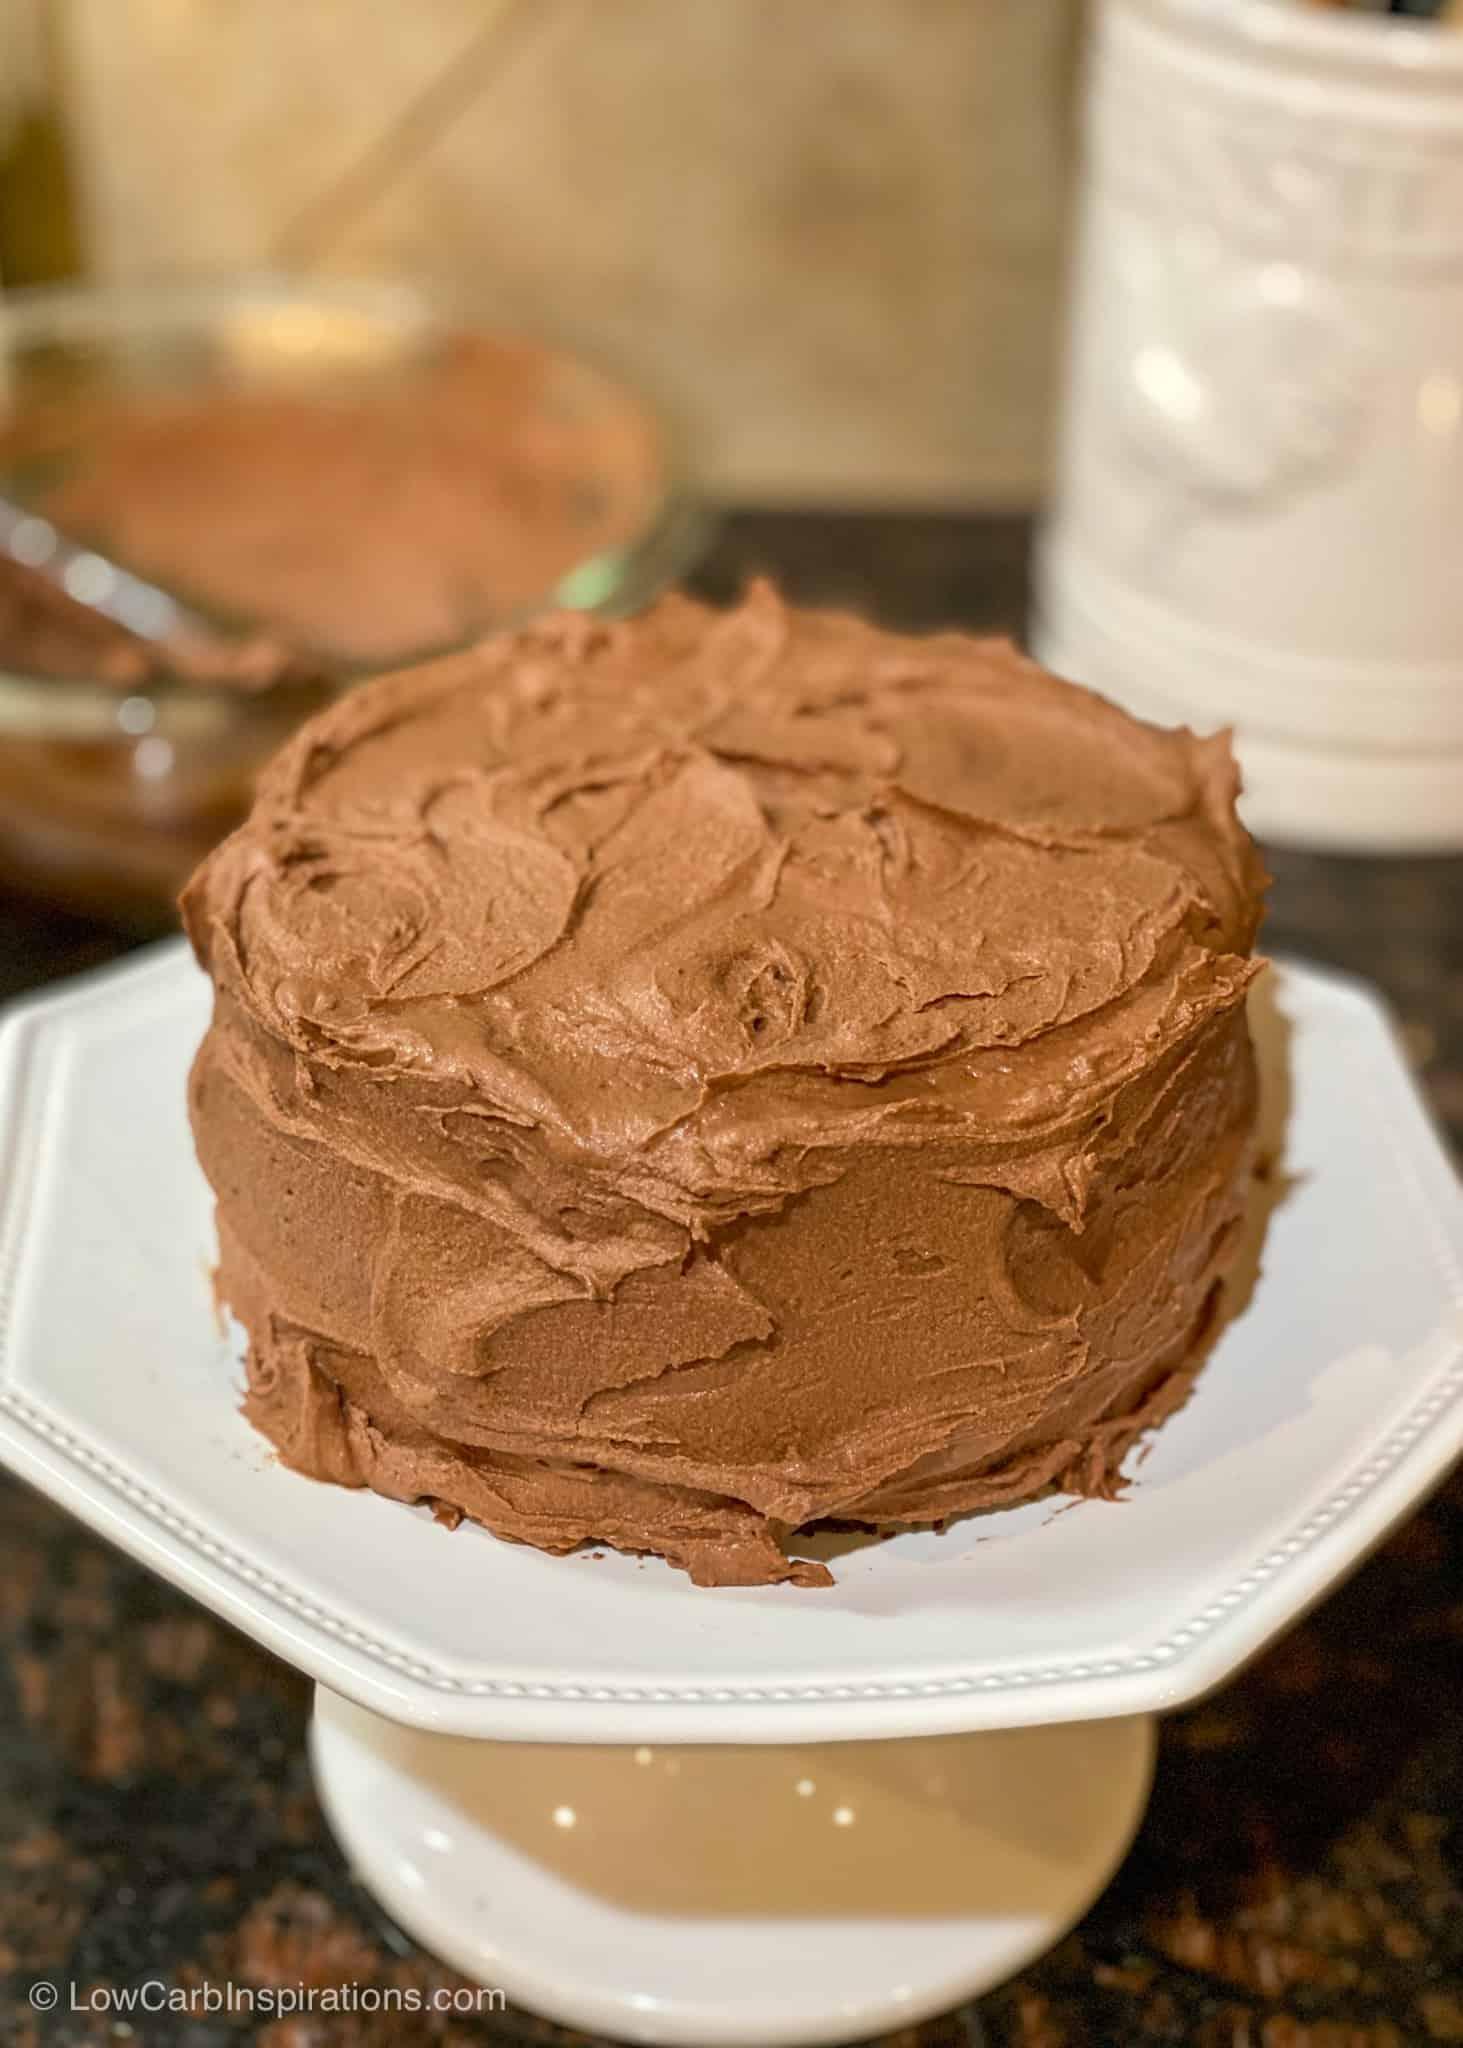 Keto Chocolate Crazy Cake Recipe with sugar free chocolate frosting recipe